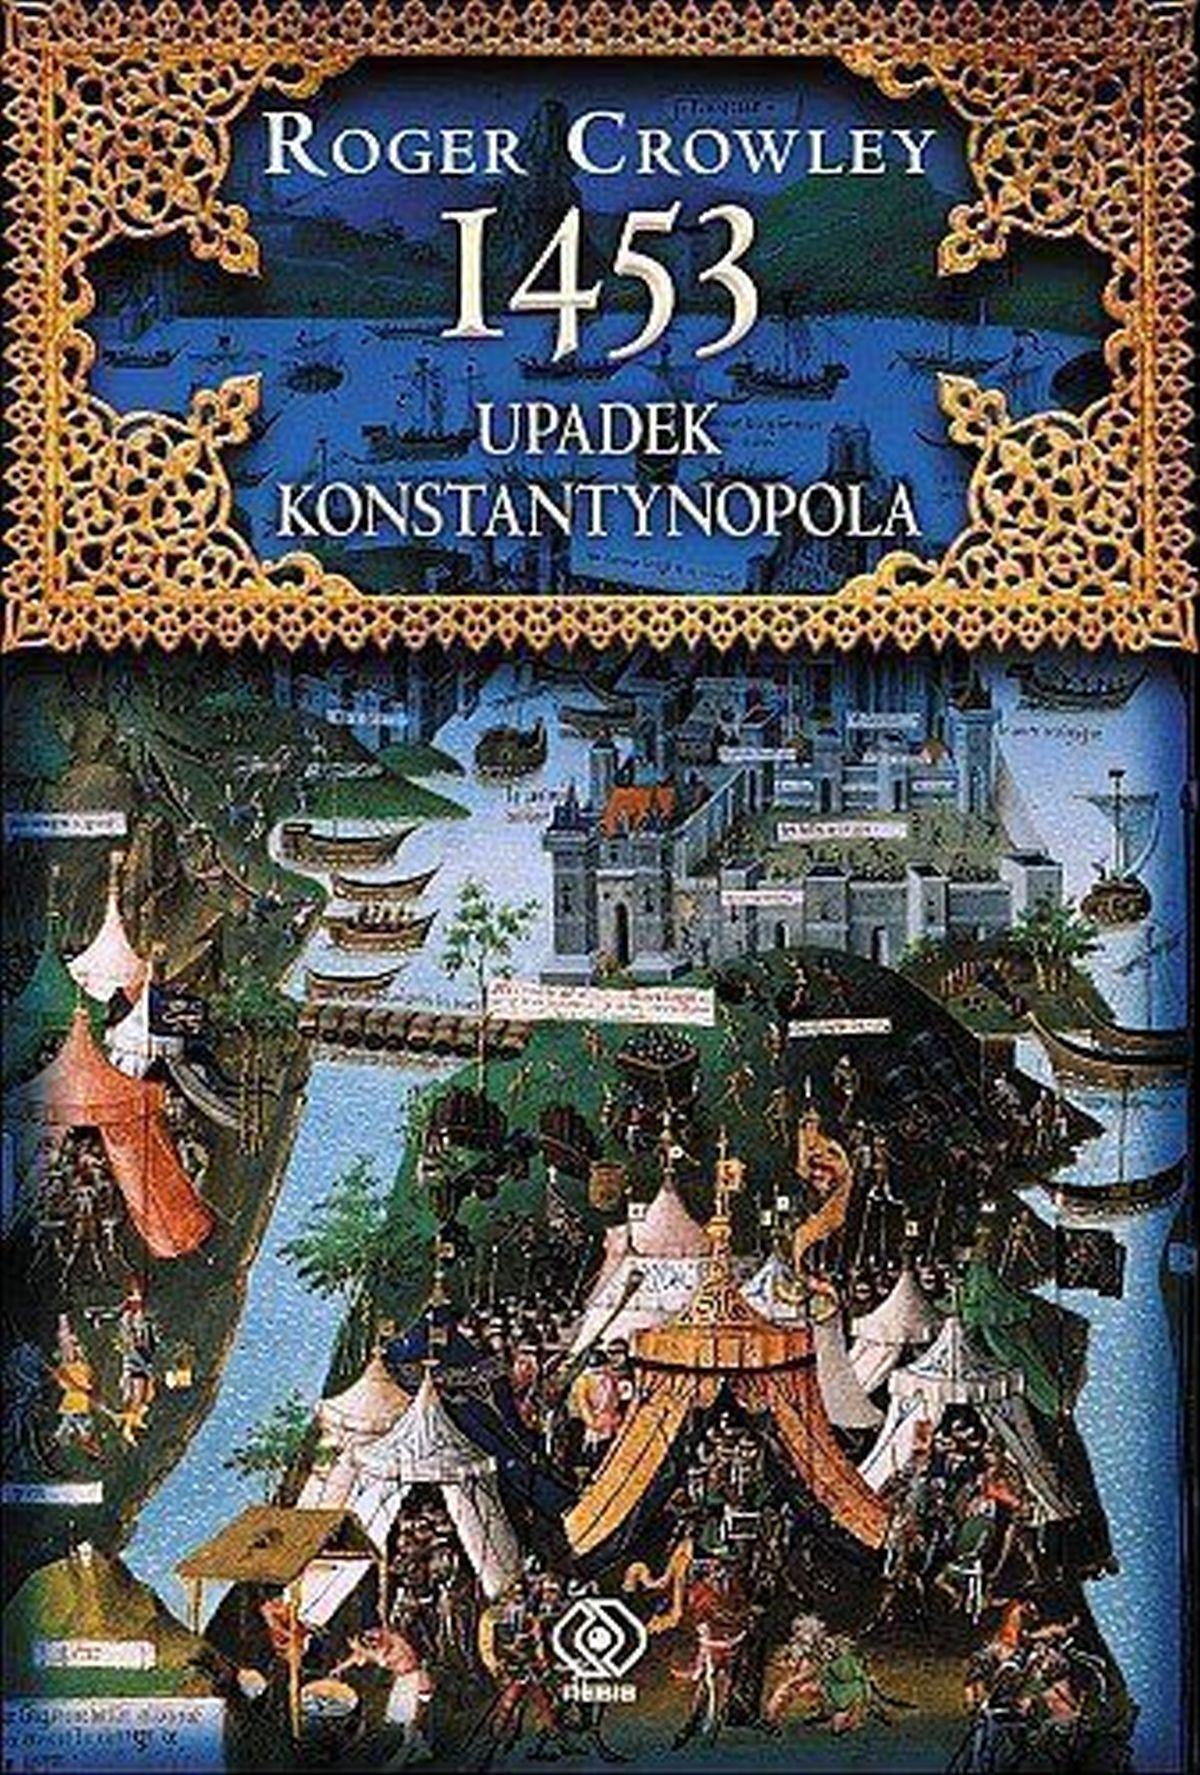 1453: Upadek Konstantynopola